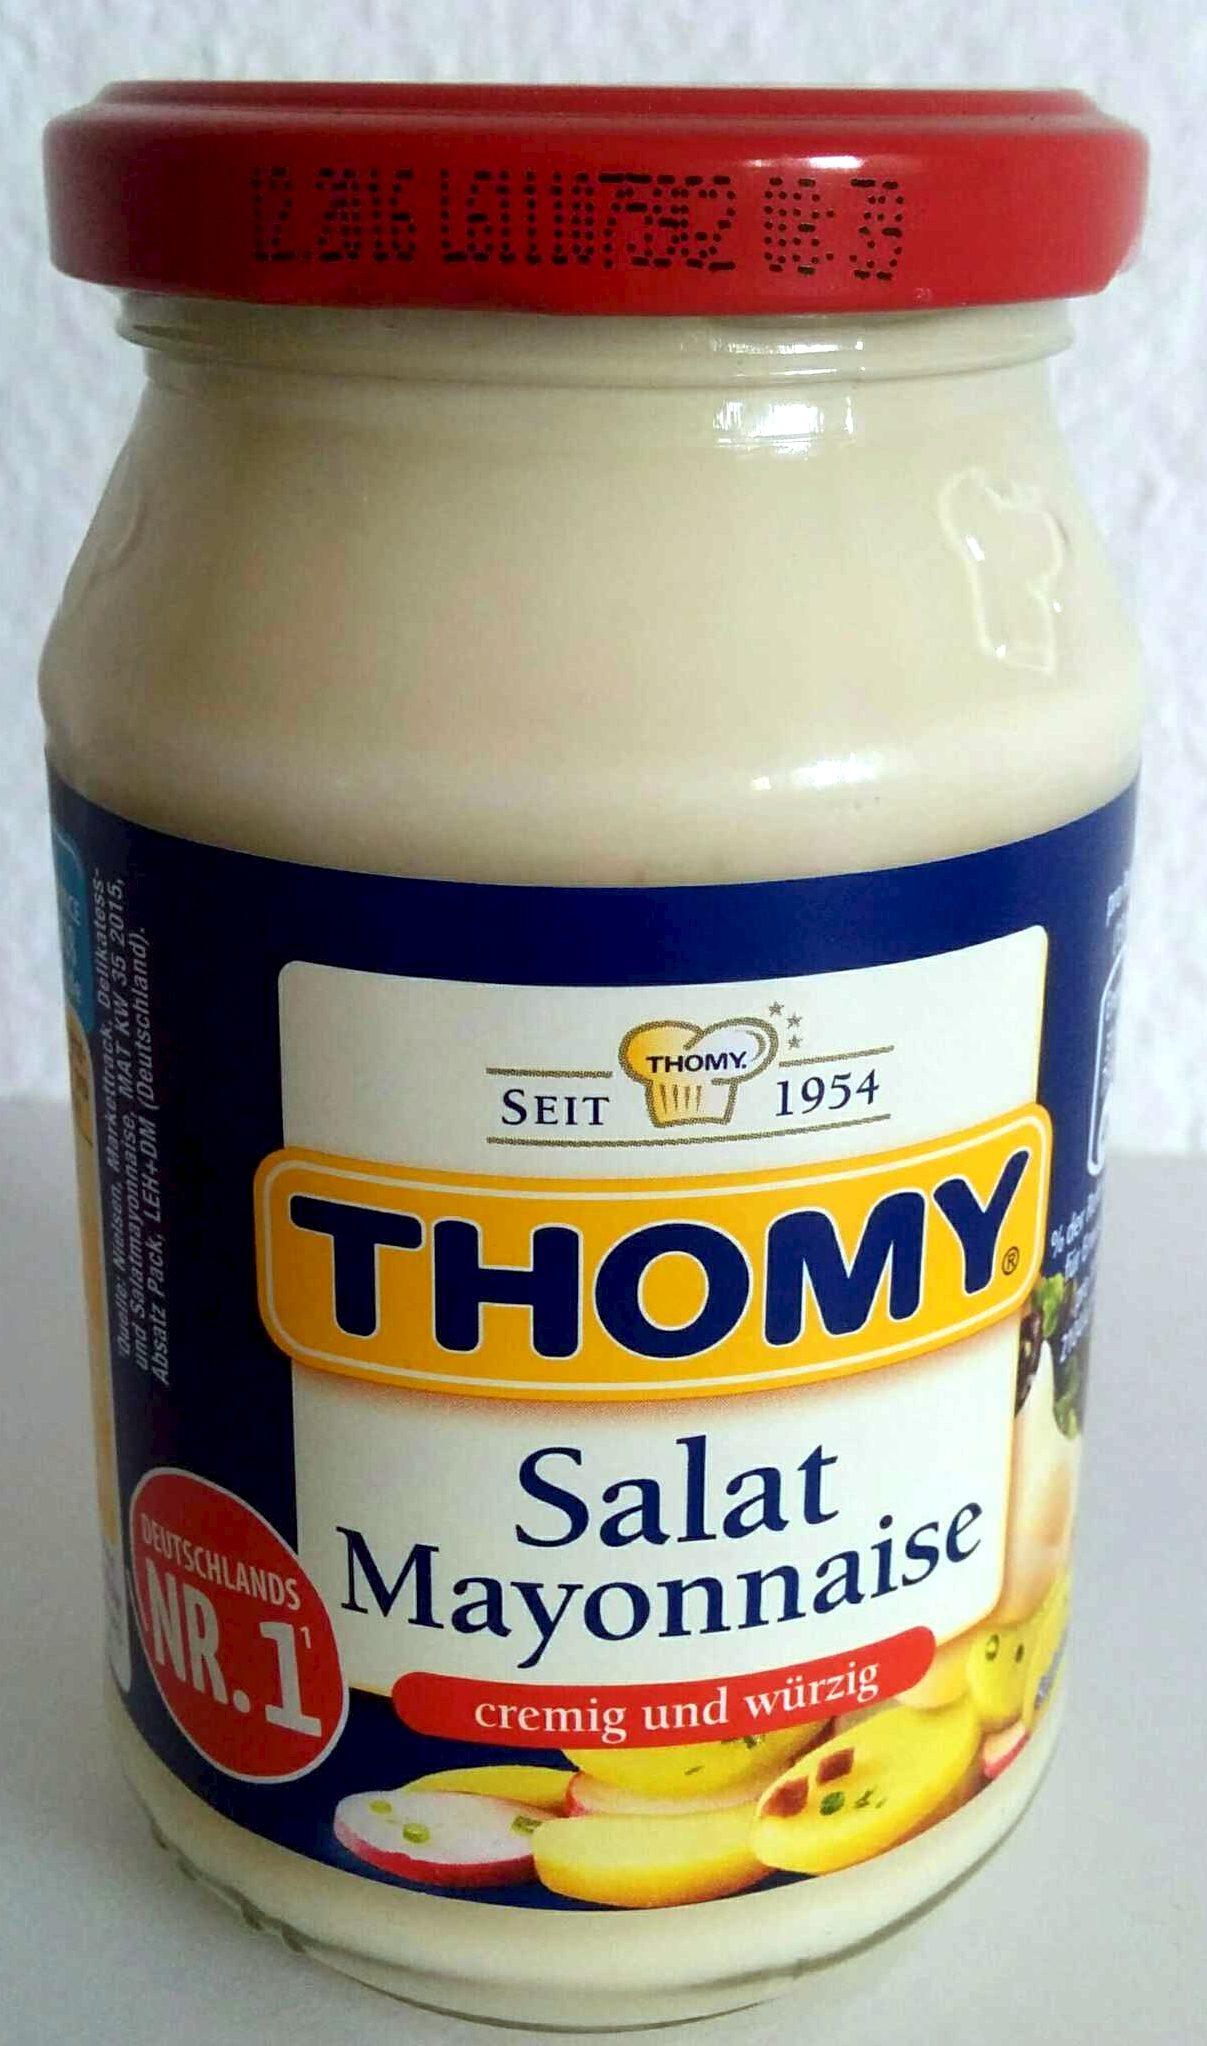 Salat Mayonnaise - Product - de